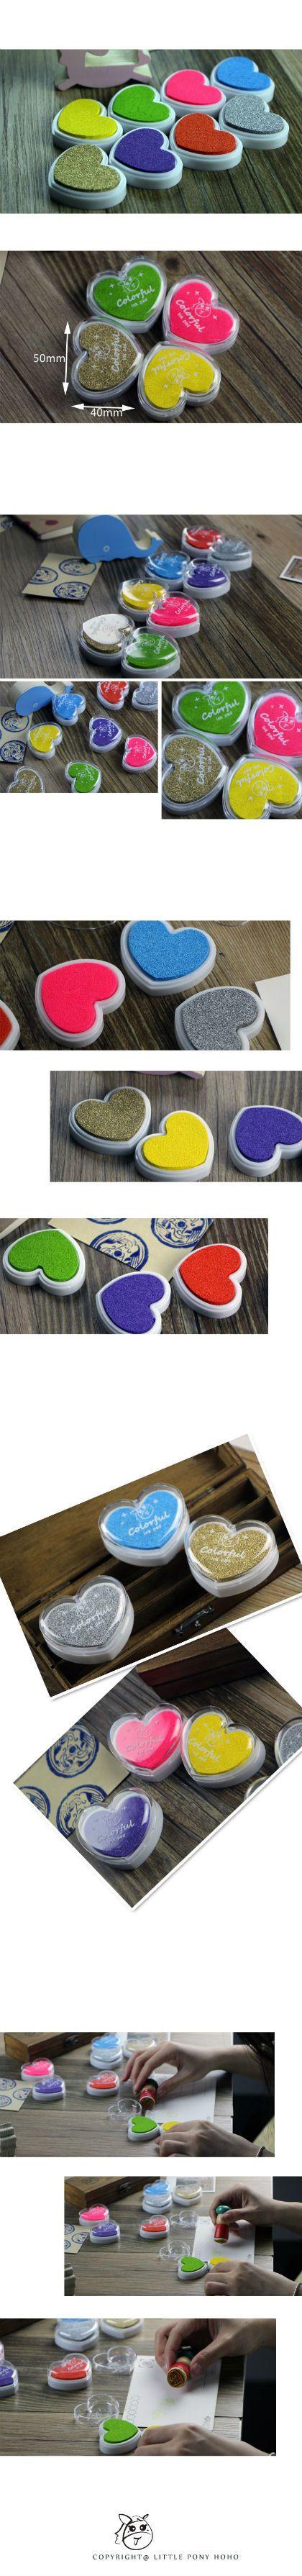 Finger Paint Heart Shape Inkpad Colorful Cartoon Inkpad Ink Stamp Ink Pad set for DIY funny Work Scrapbooking Album